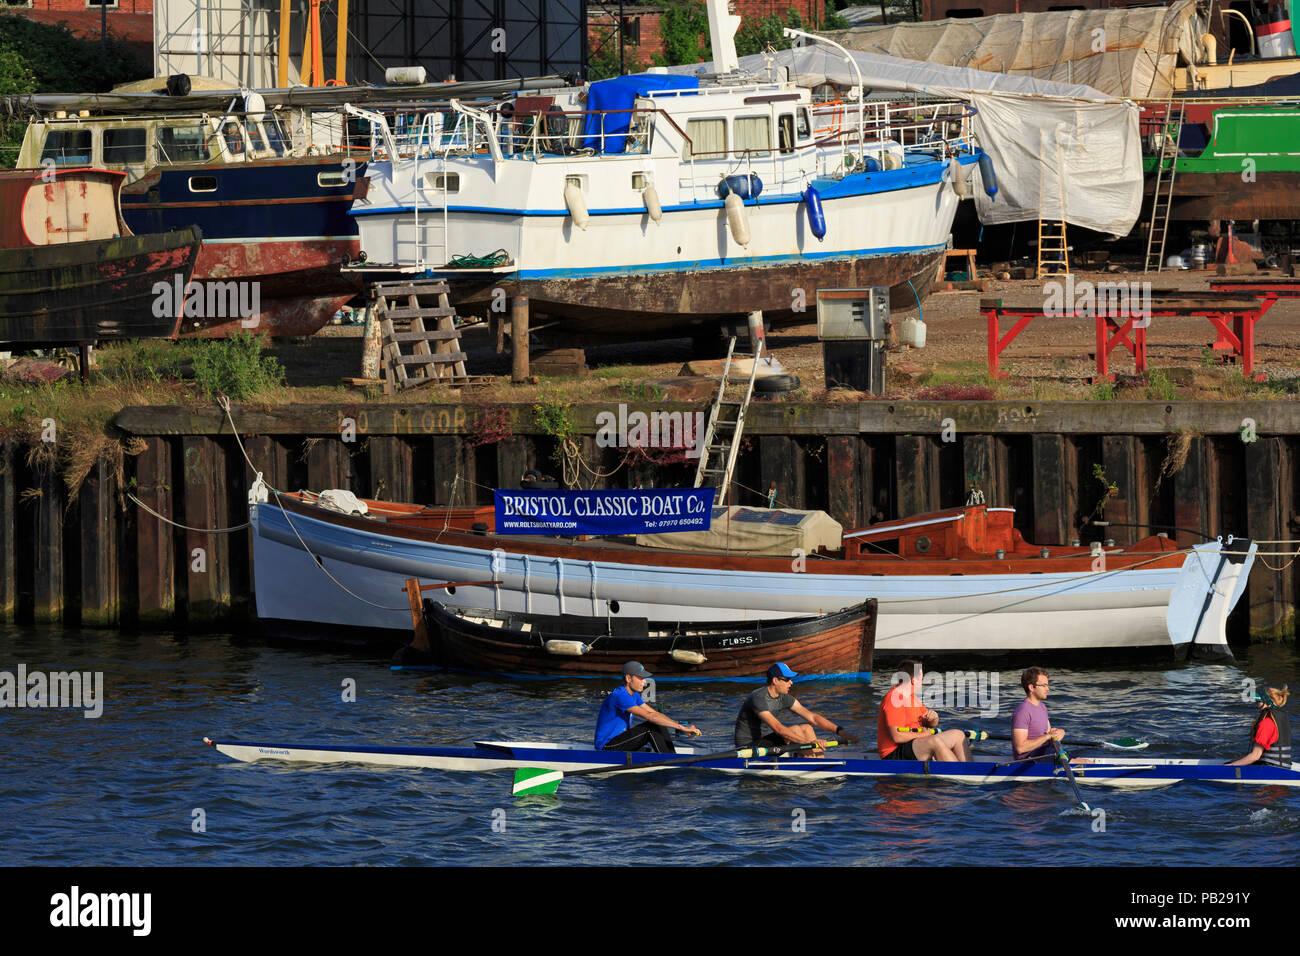 Rowers, Bristol City, Bristol County, England, United Kingdom - Stock Image